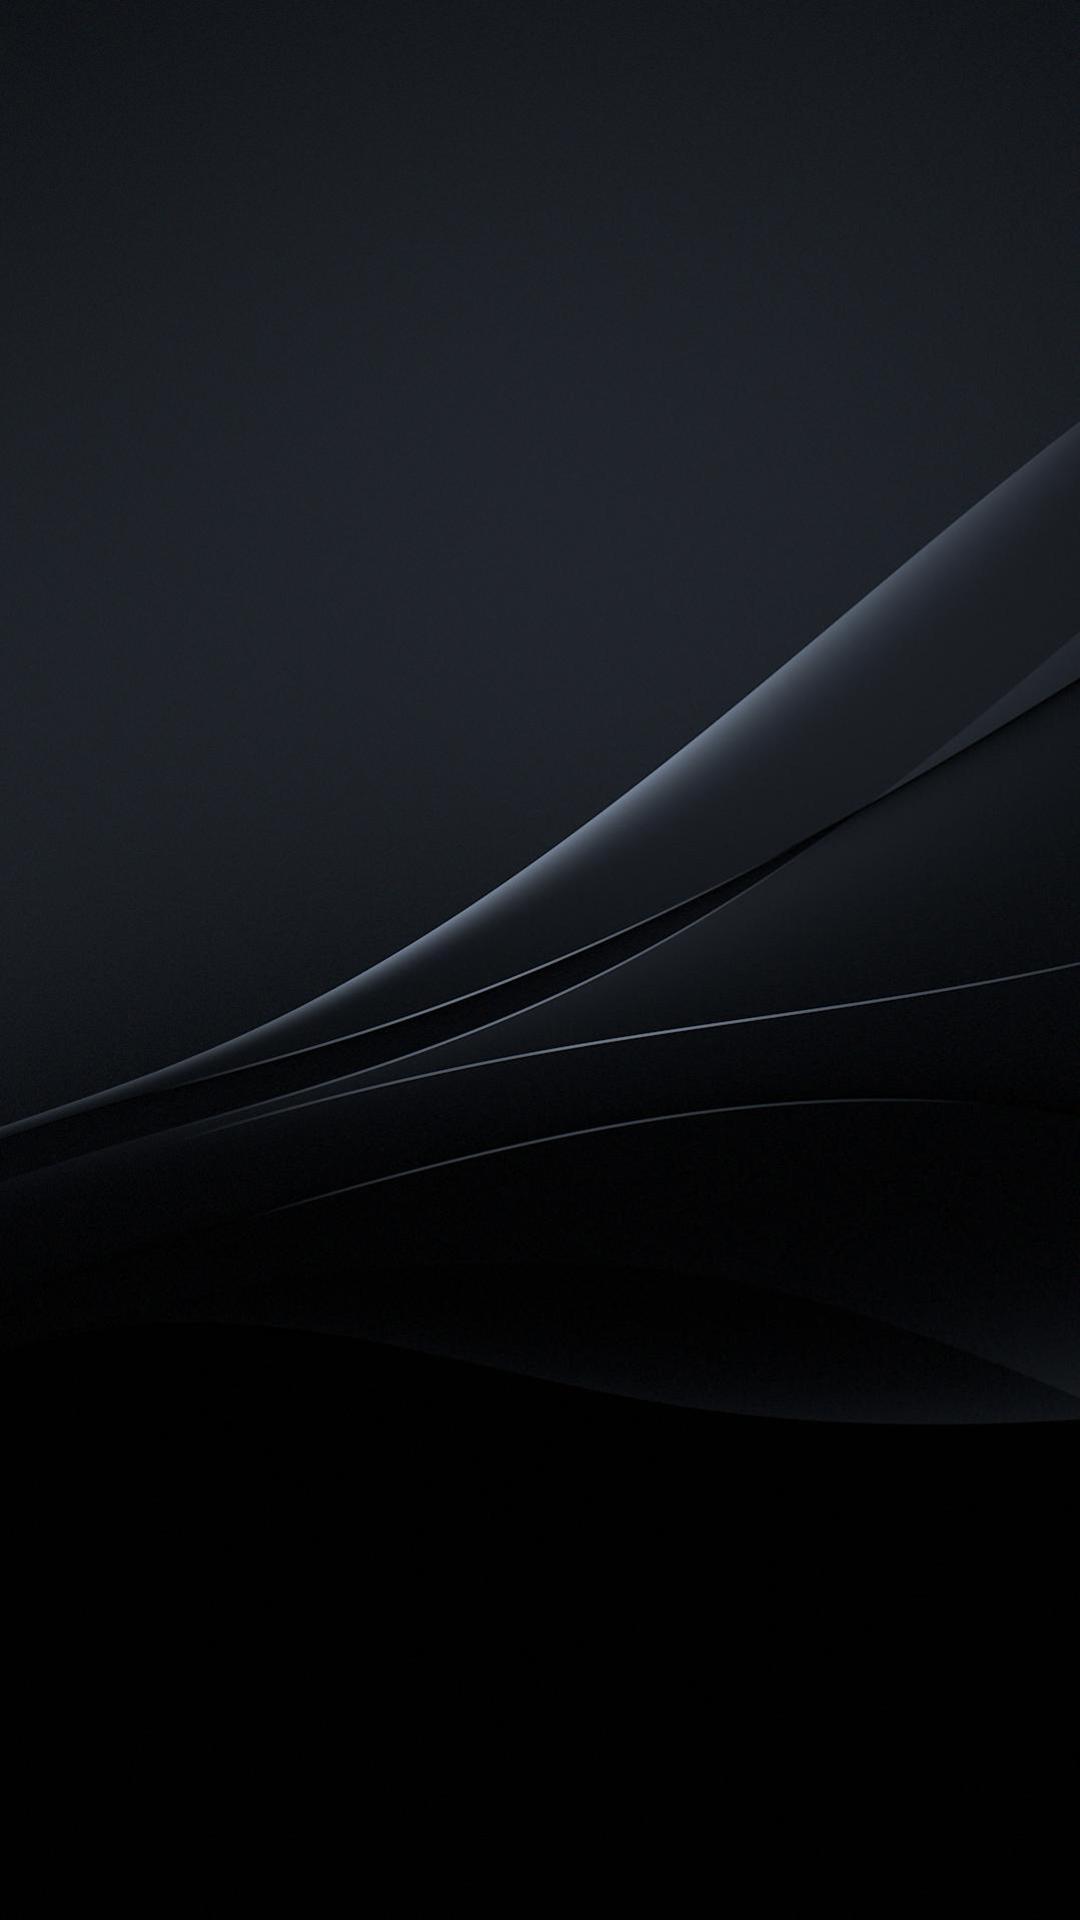 Xperia Lollipop Black Experience Flow Wallpaper